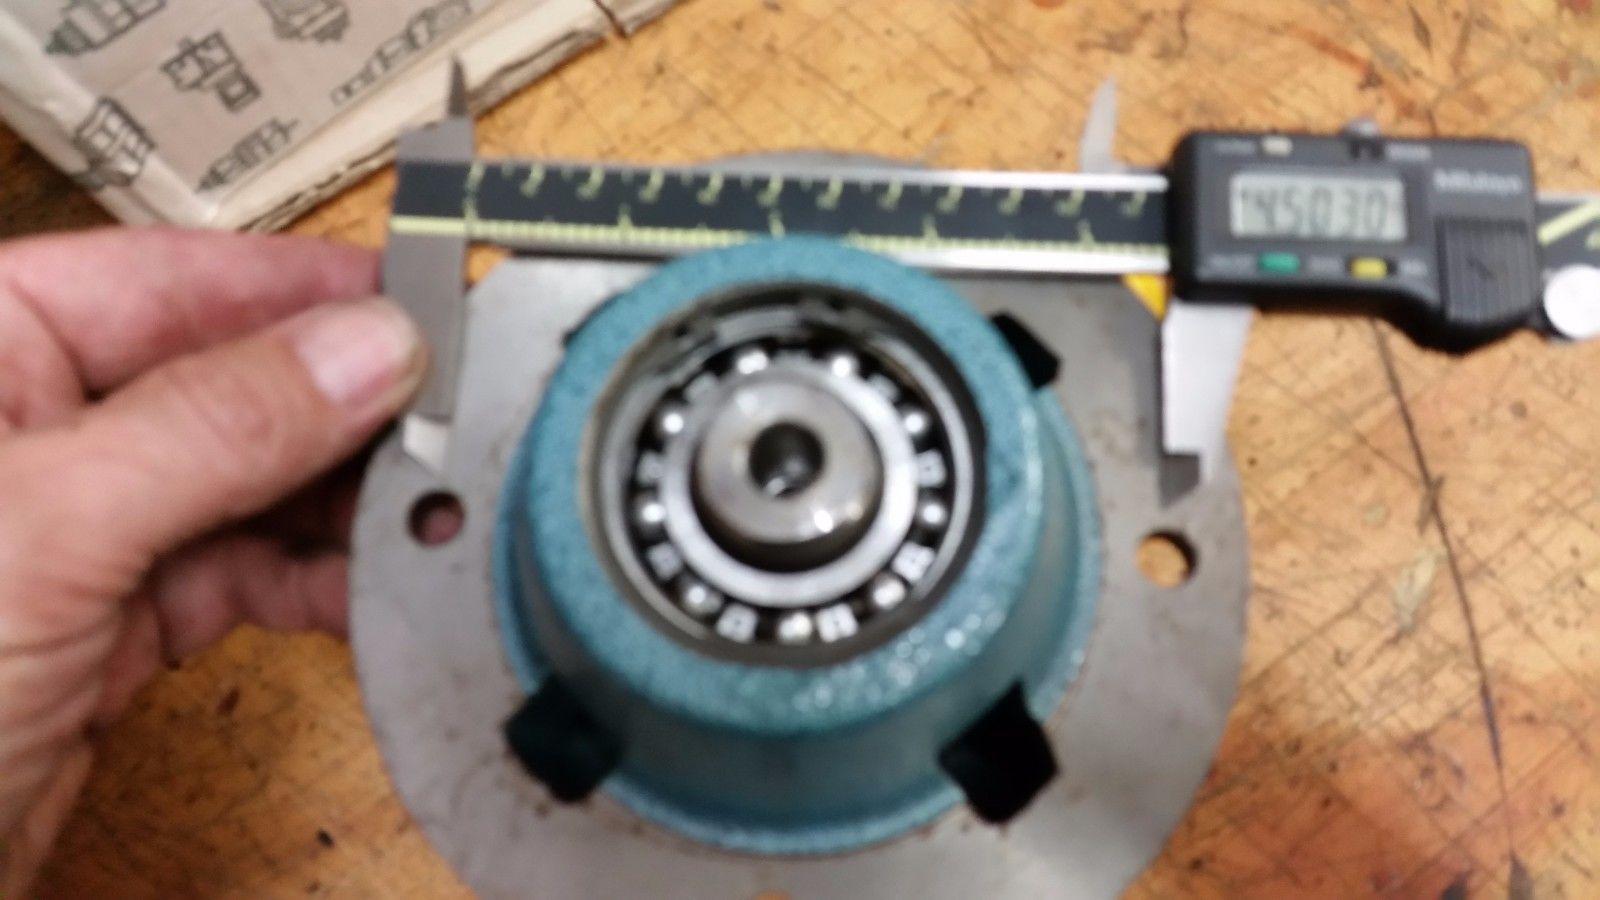 DAVID BROWN SWIFT KIT INLINE HOUSING KIT M03/04 M0320-Y 10MM F TO 5/8 MALE SHAFT